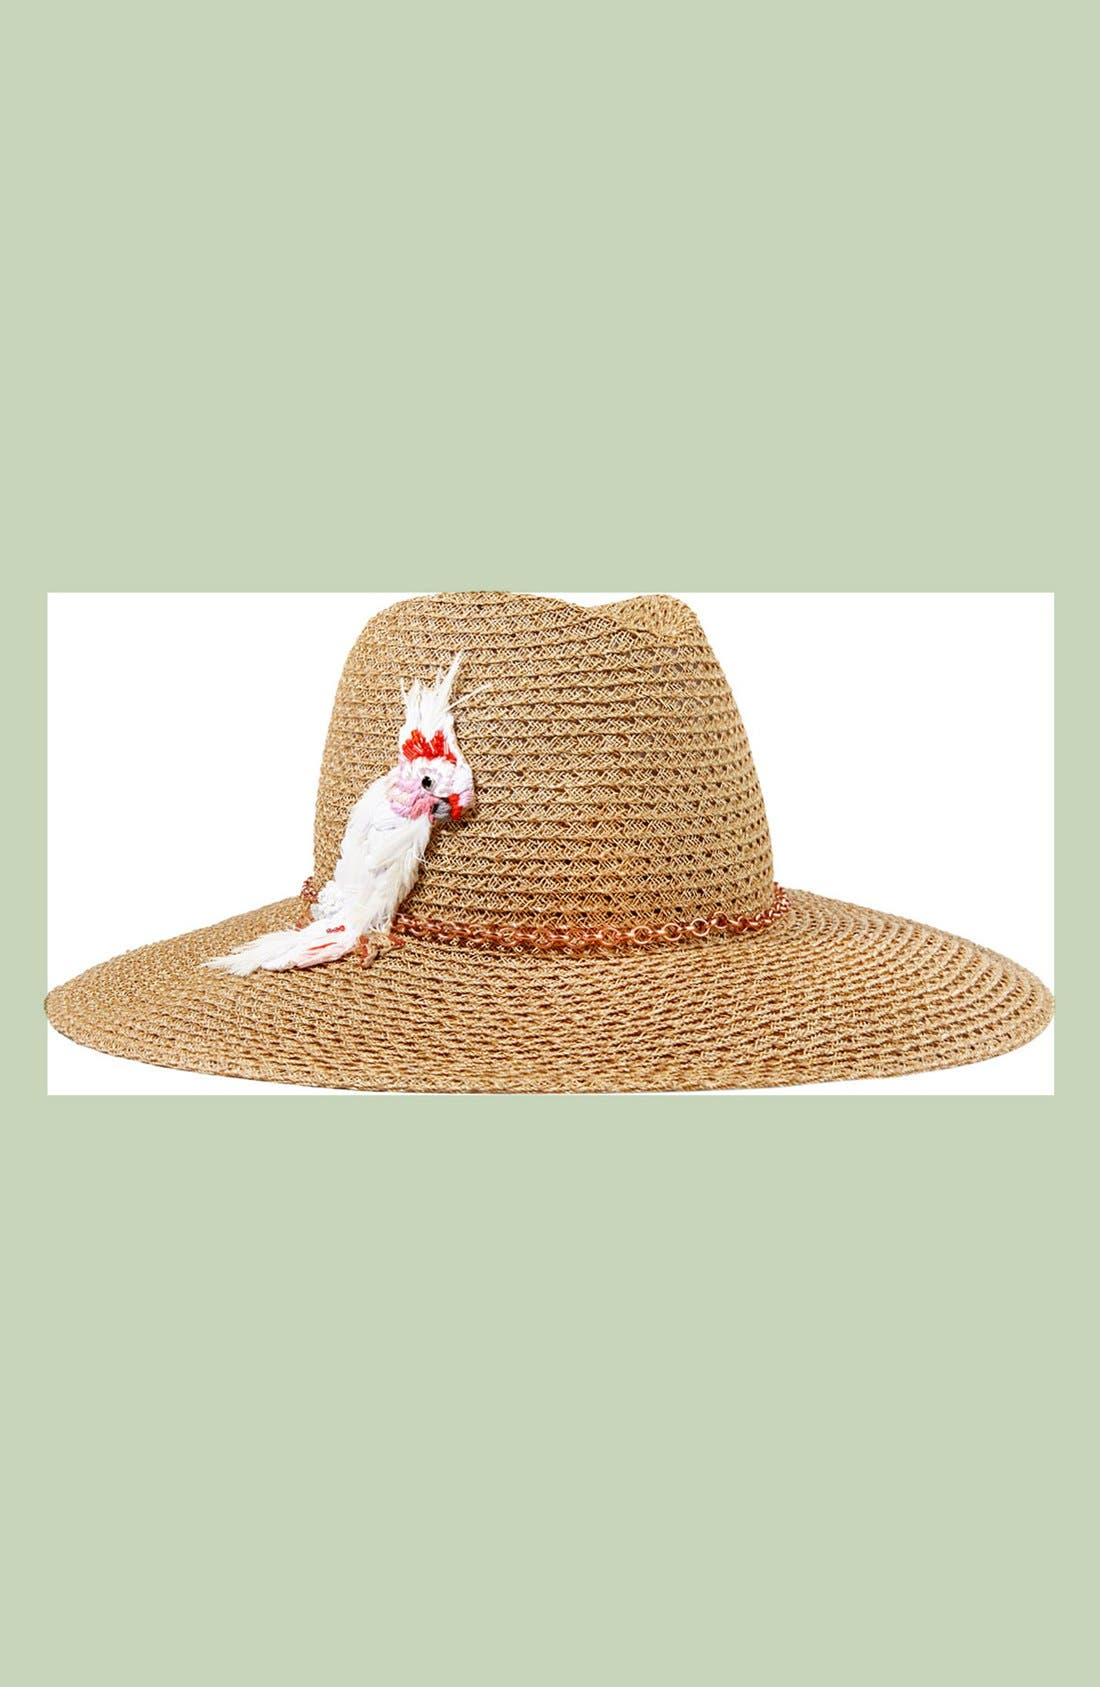 'Emmanuelle' Cockatoo Ornament Straw Hat,                             Alternate thumbnail 3, color,                             250